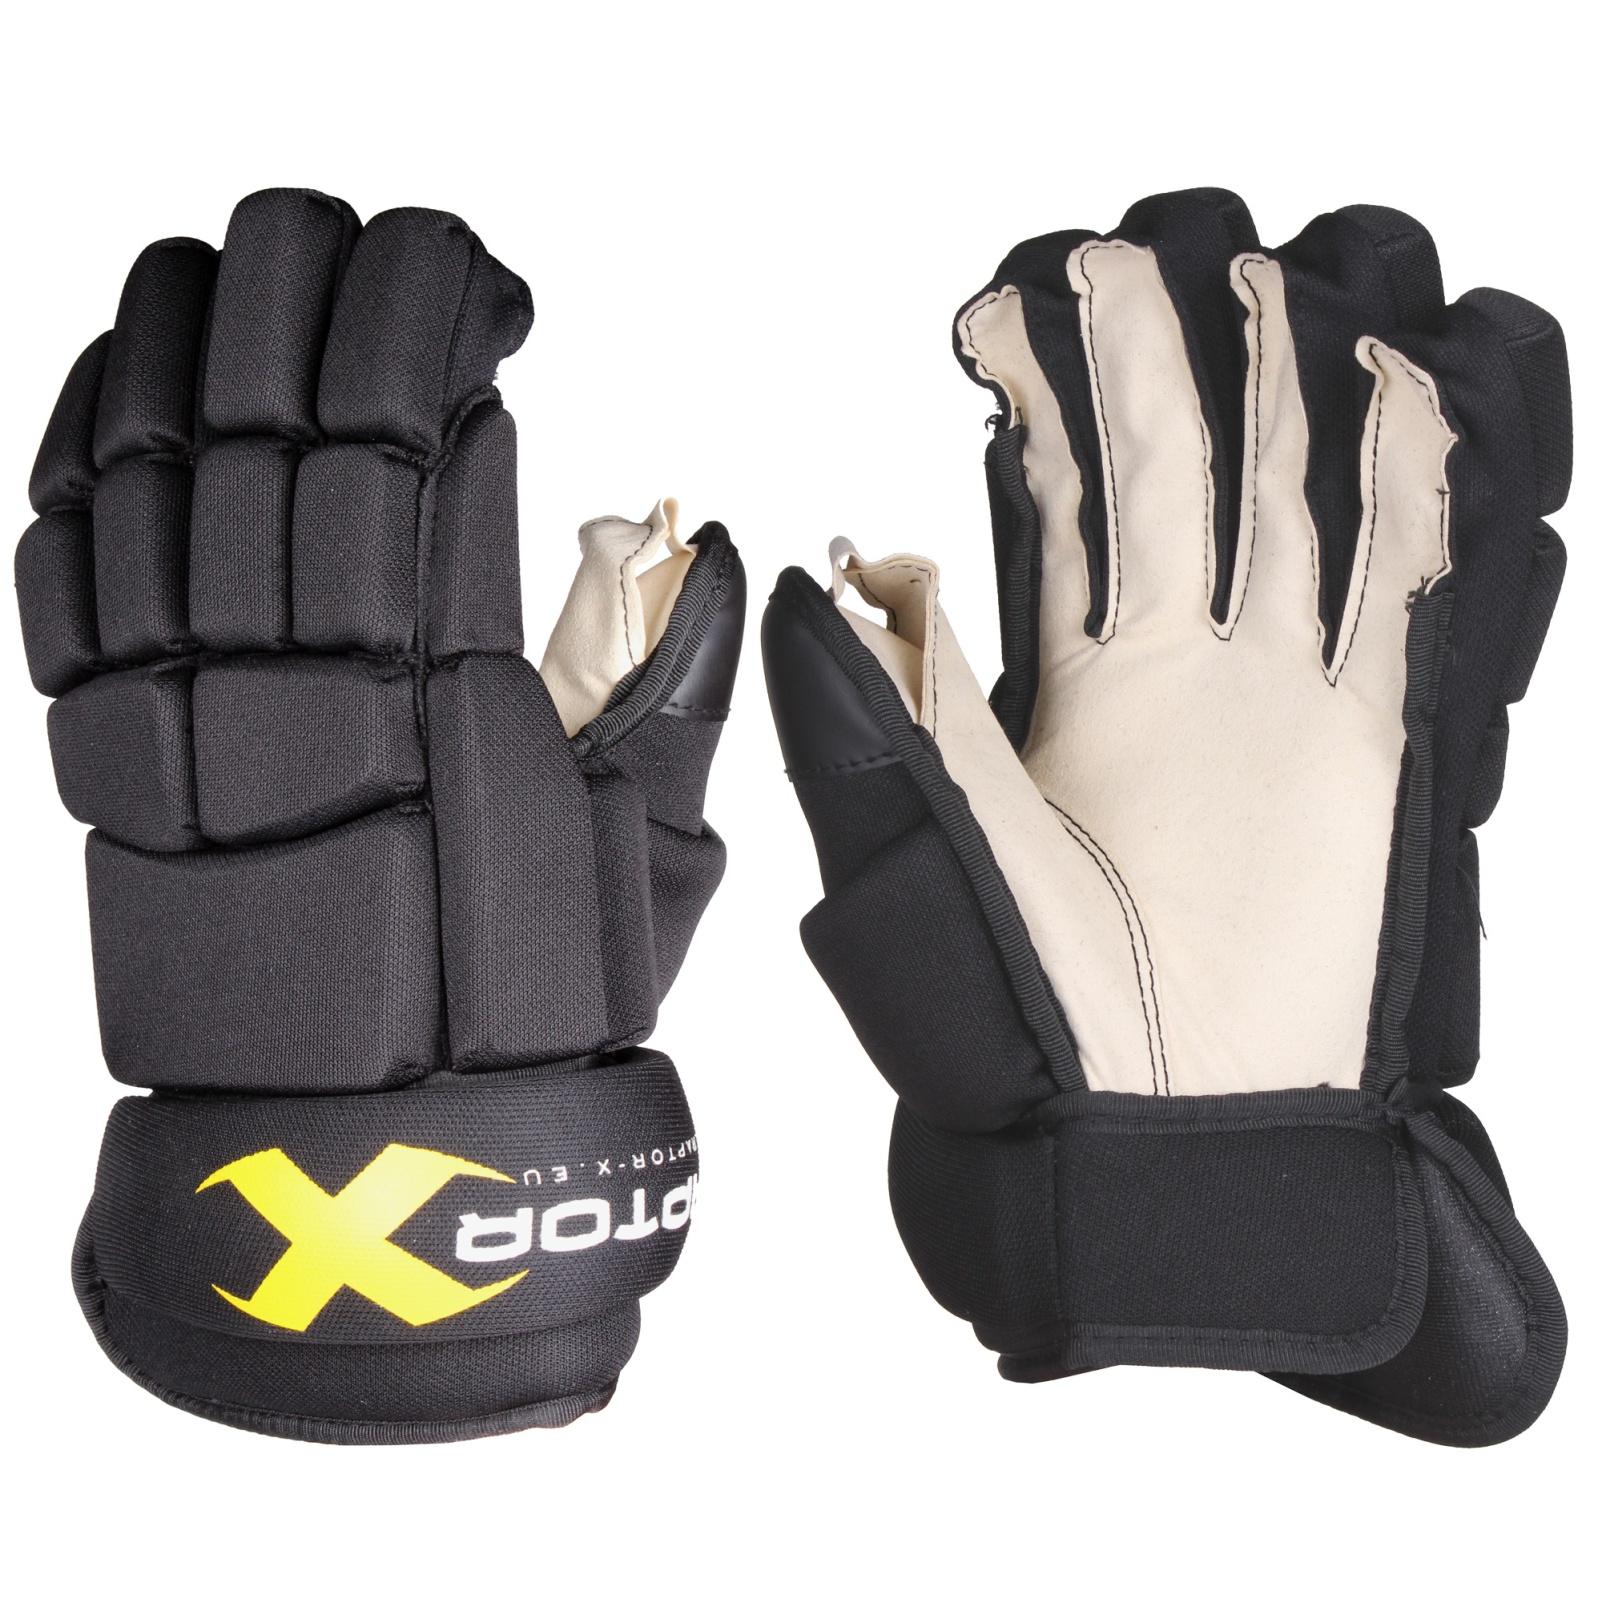 Hokejové rukavice Raptor-X senior, čierne veľ. 14''